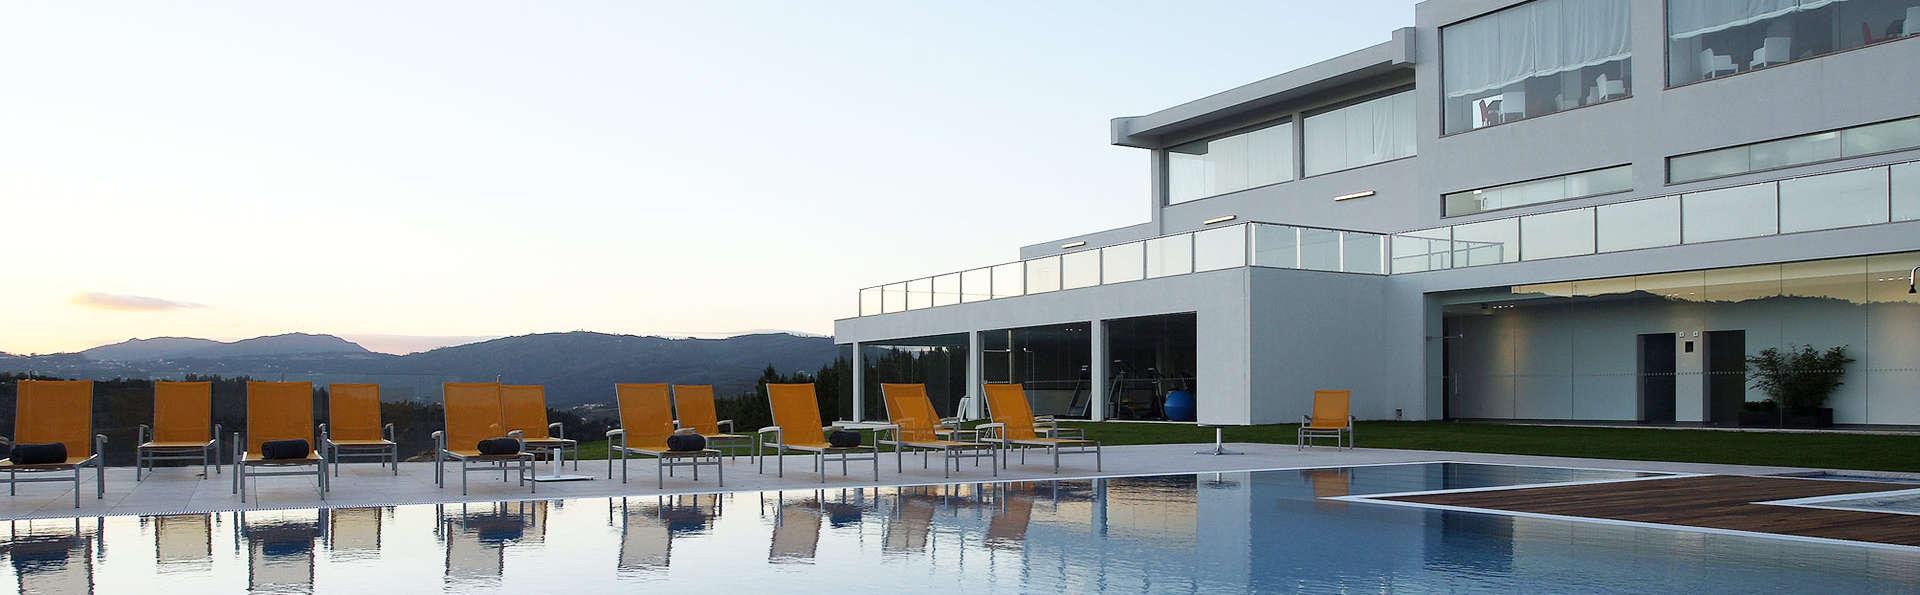 Agua Hotels Mondim de Basto - EDIT_pool1.jpg